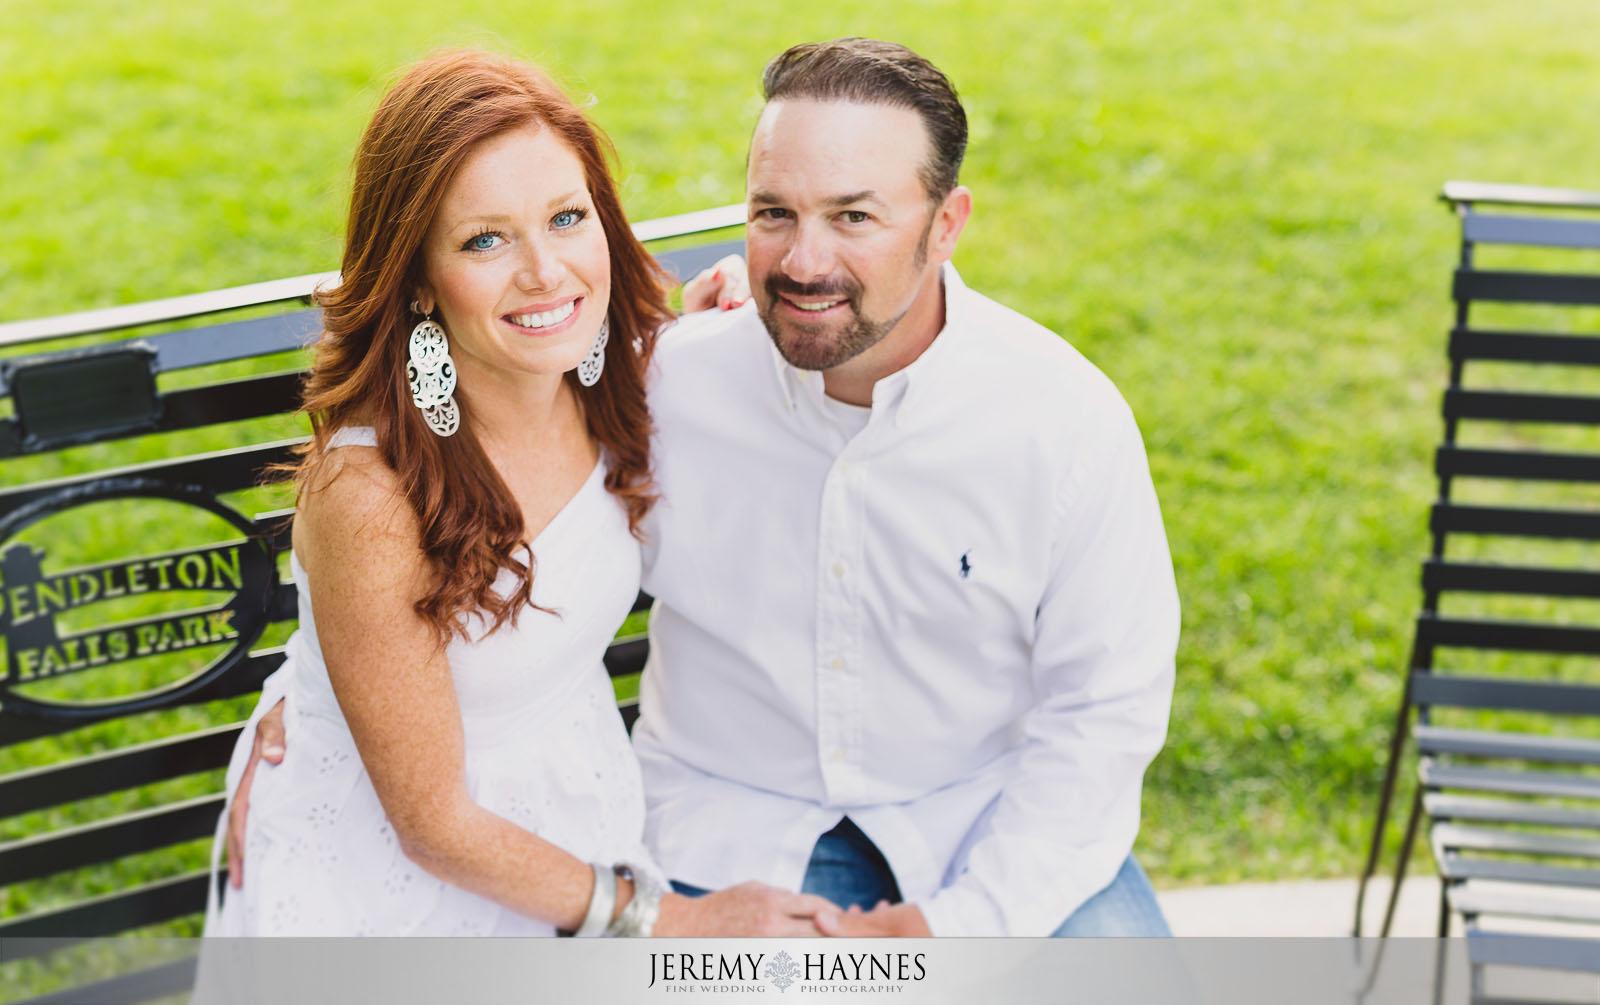 Jason + Morgan Falls Park Pendleton Engagement 4.jpg